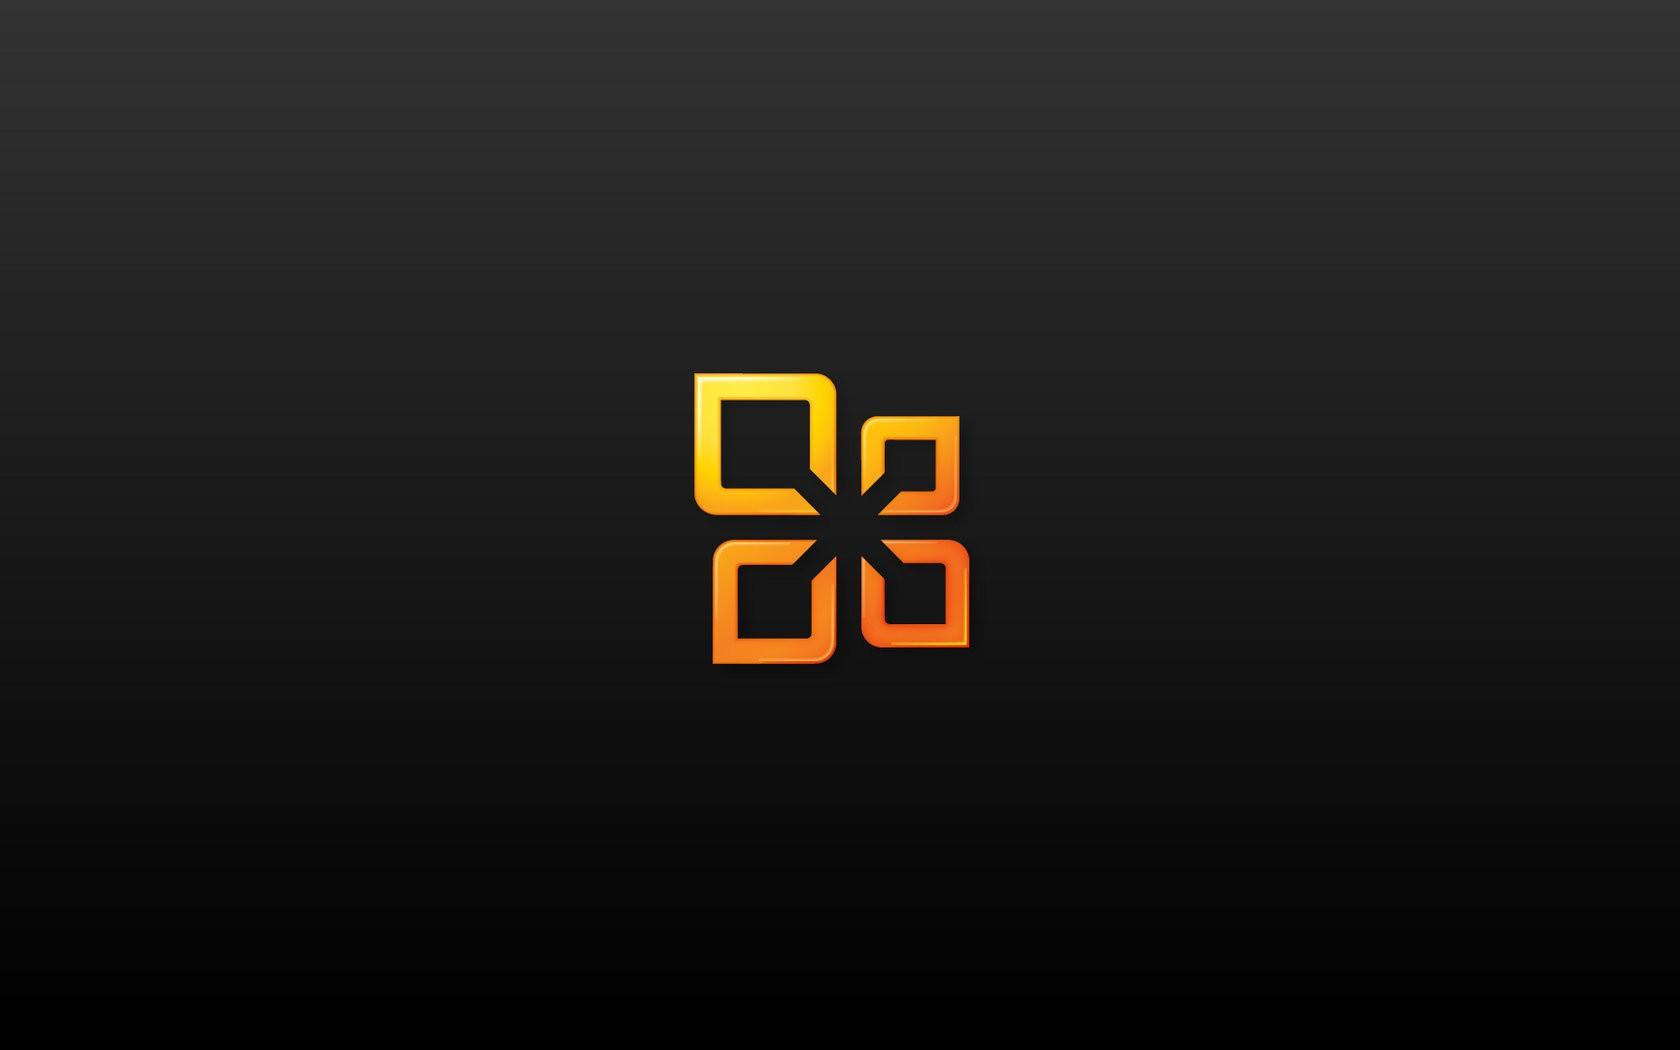 Microsoft Office Myspace Backgrounds Microsoft Office Backgrounds For 1680x1050